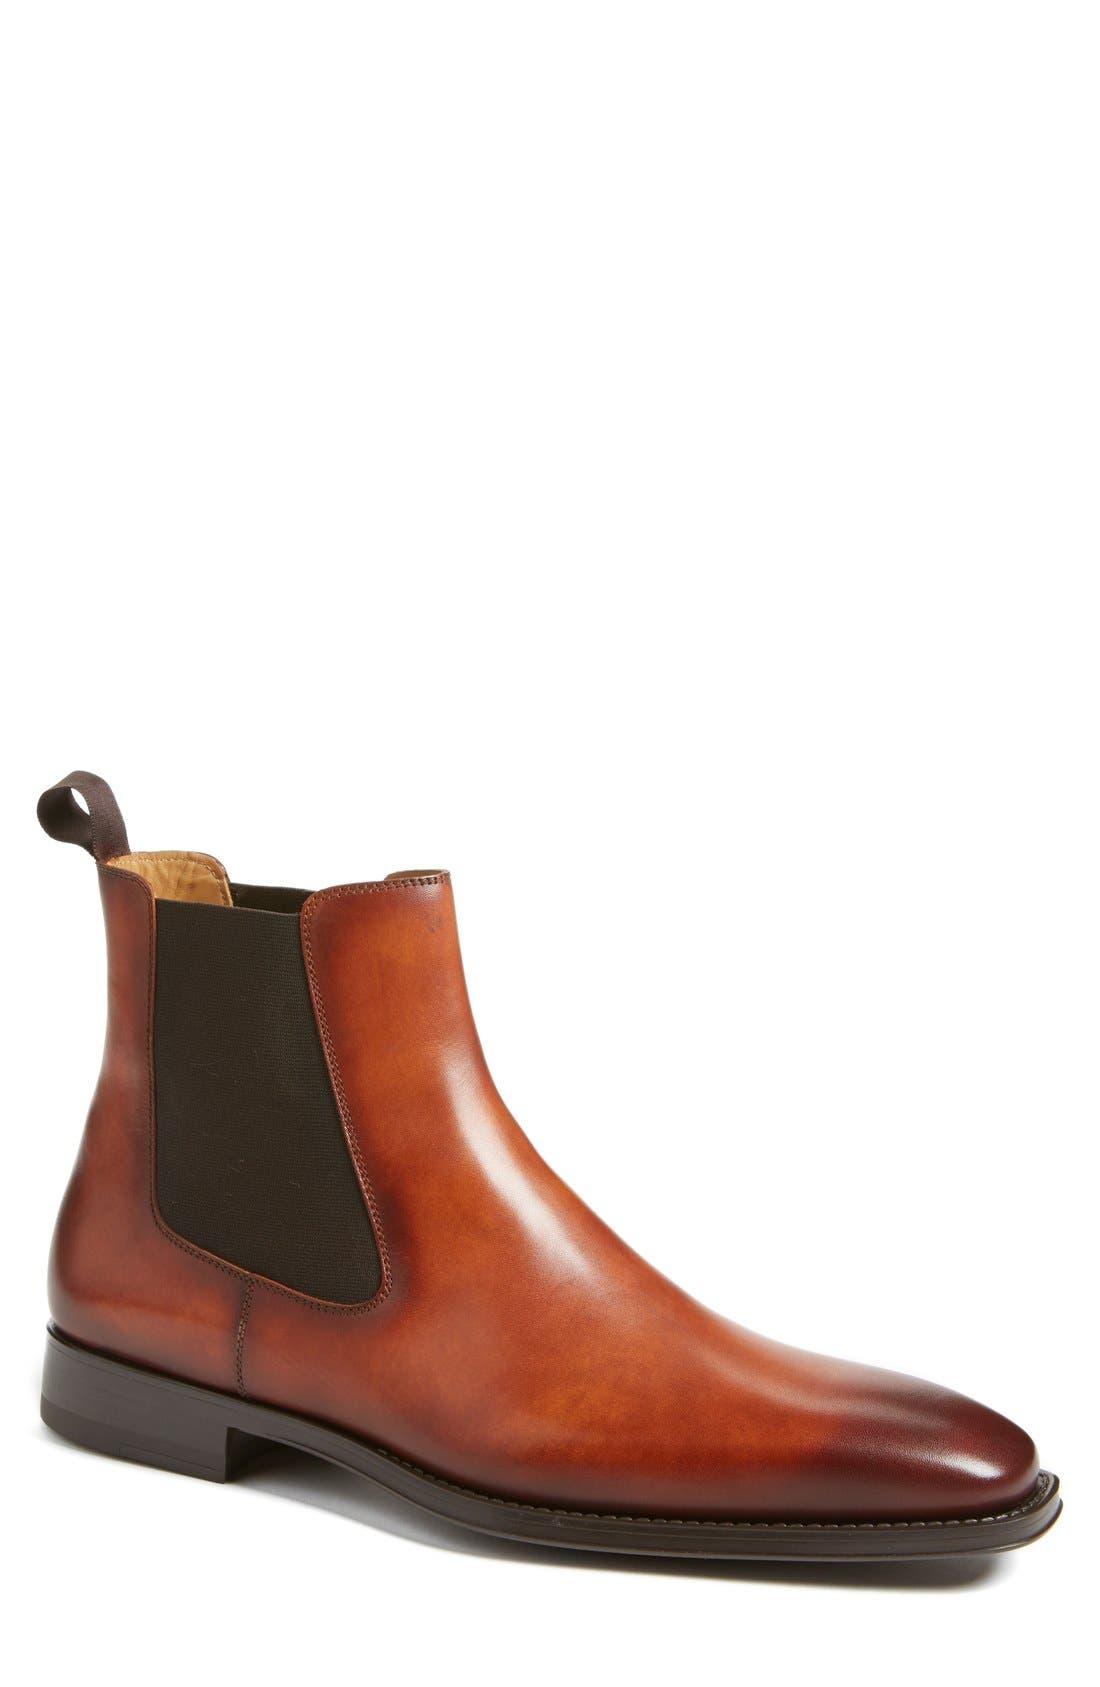 'Sean' Chelsea Boot,                         Main,                         color, Cognac